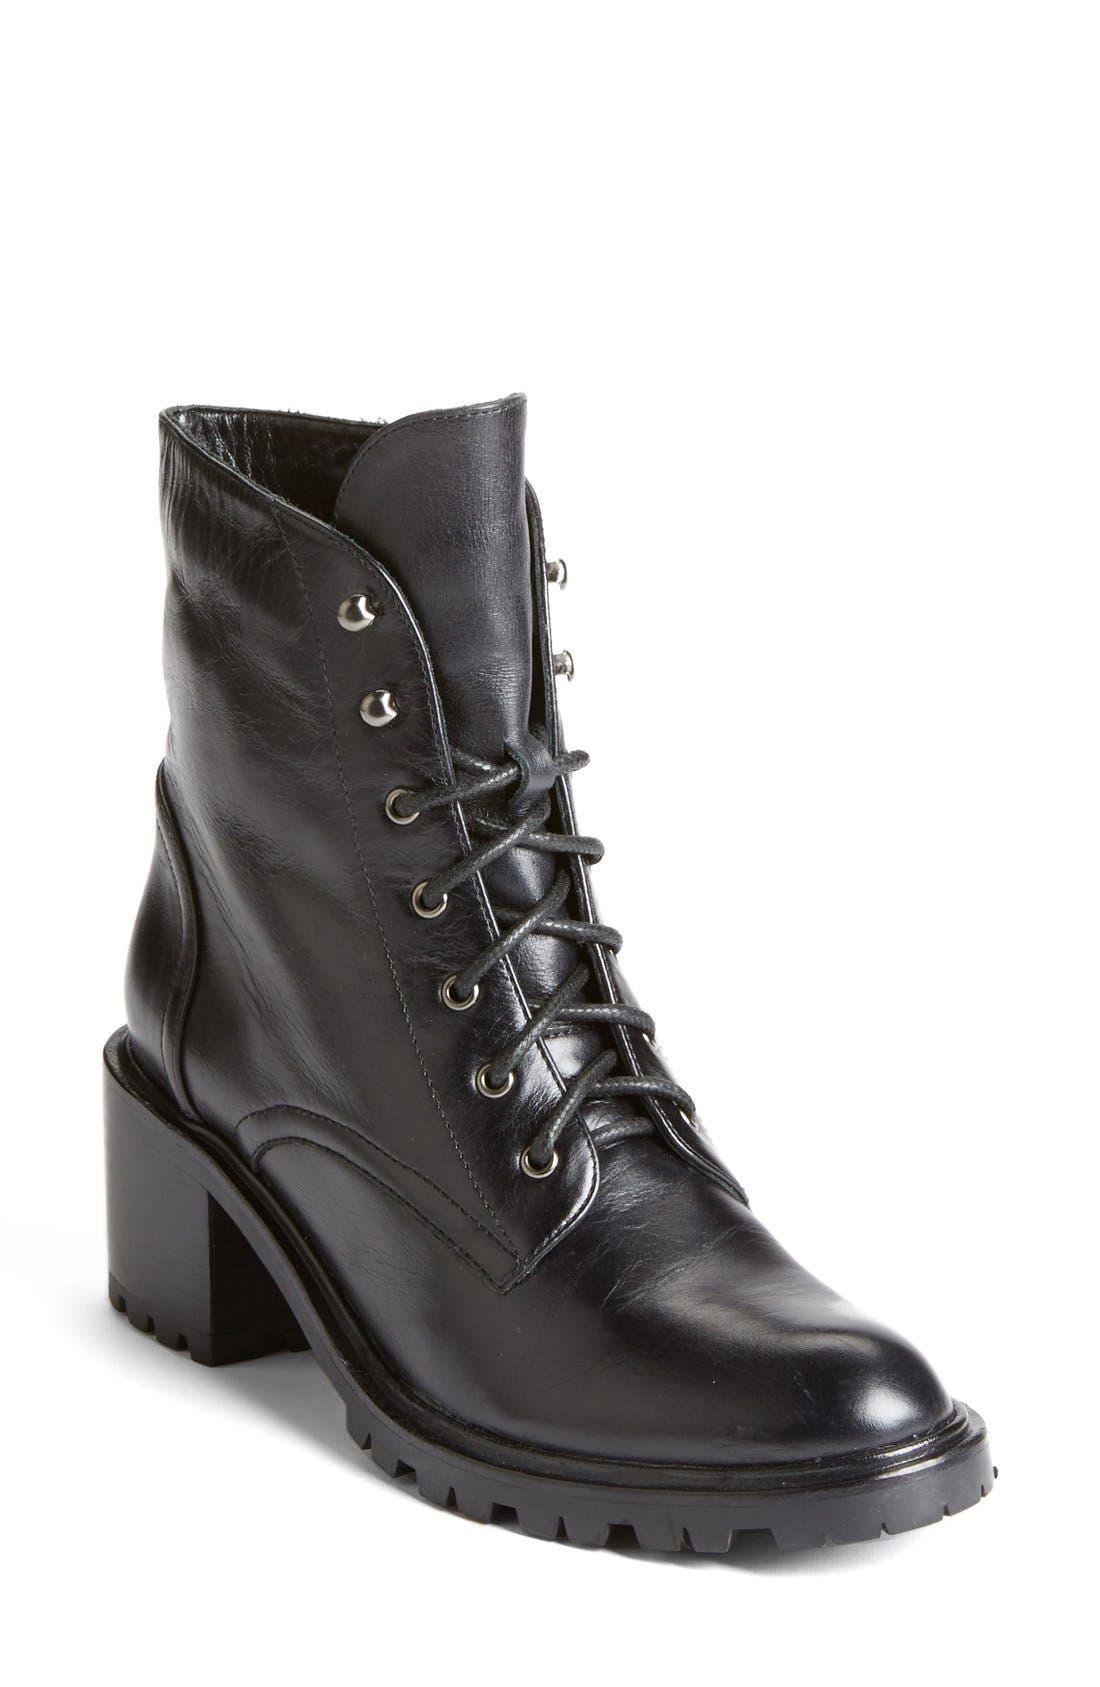 Alternate Image 1 Selected - Joie 'Bridgette' Lace-Up Boot (Women)